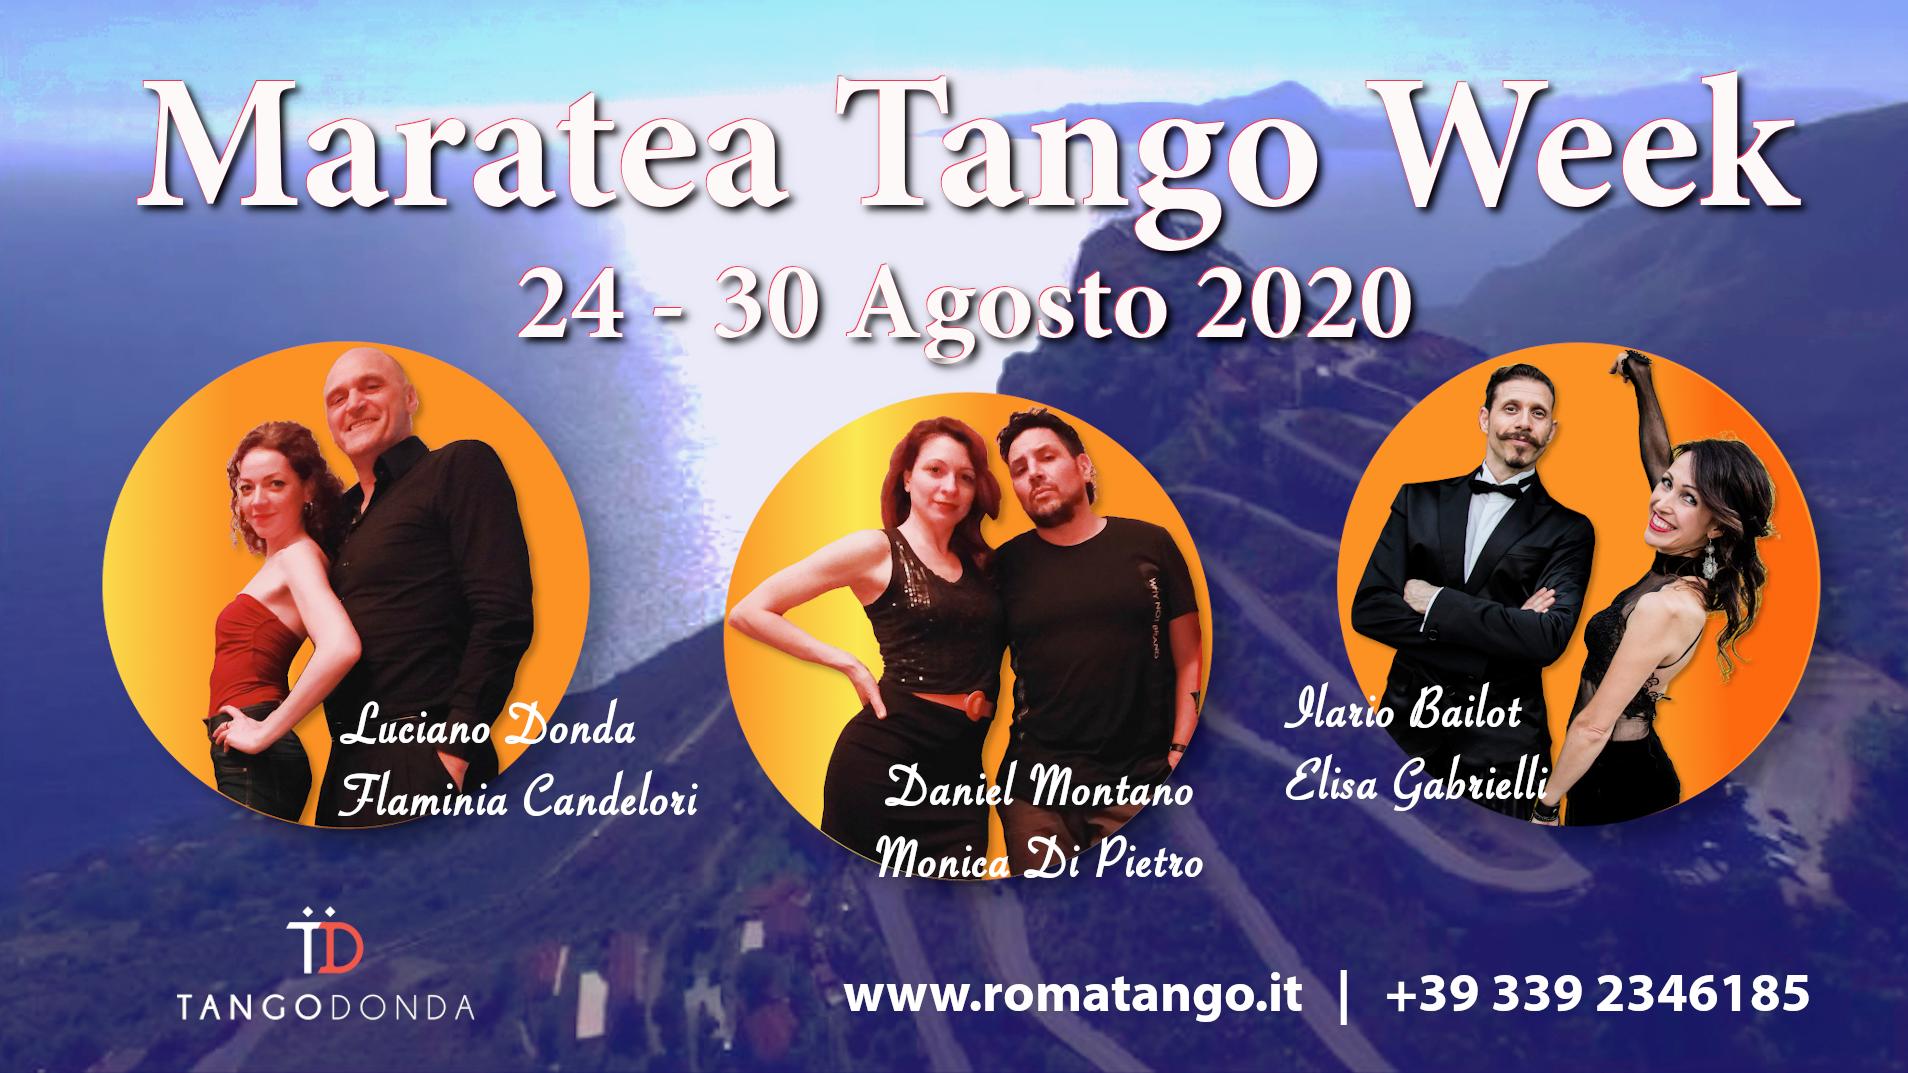 Maratea Tango Week 2020 la tua tango vacanza dal 24 al 30 Agosto